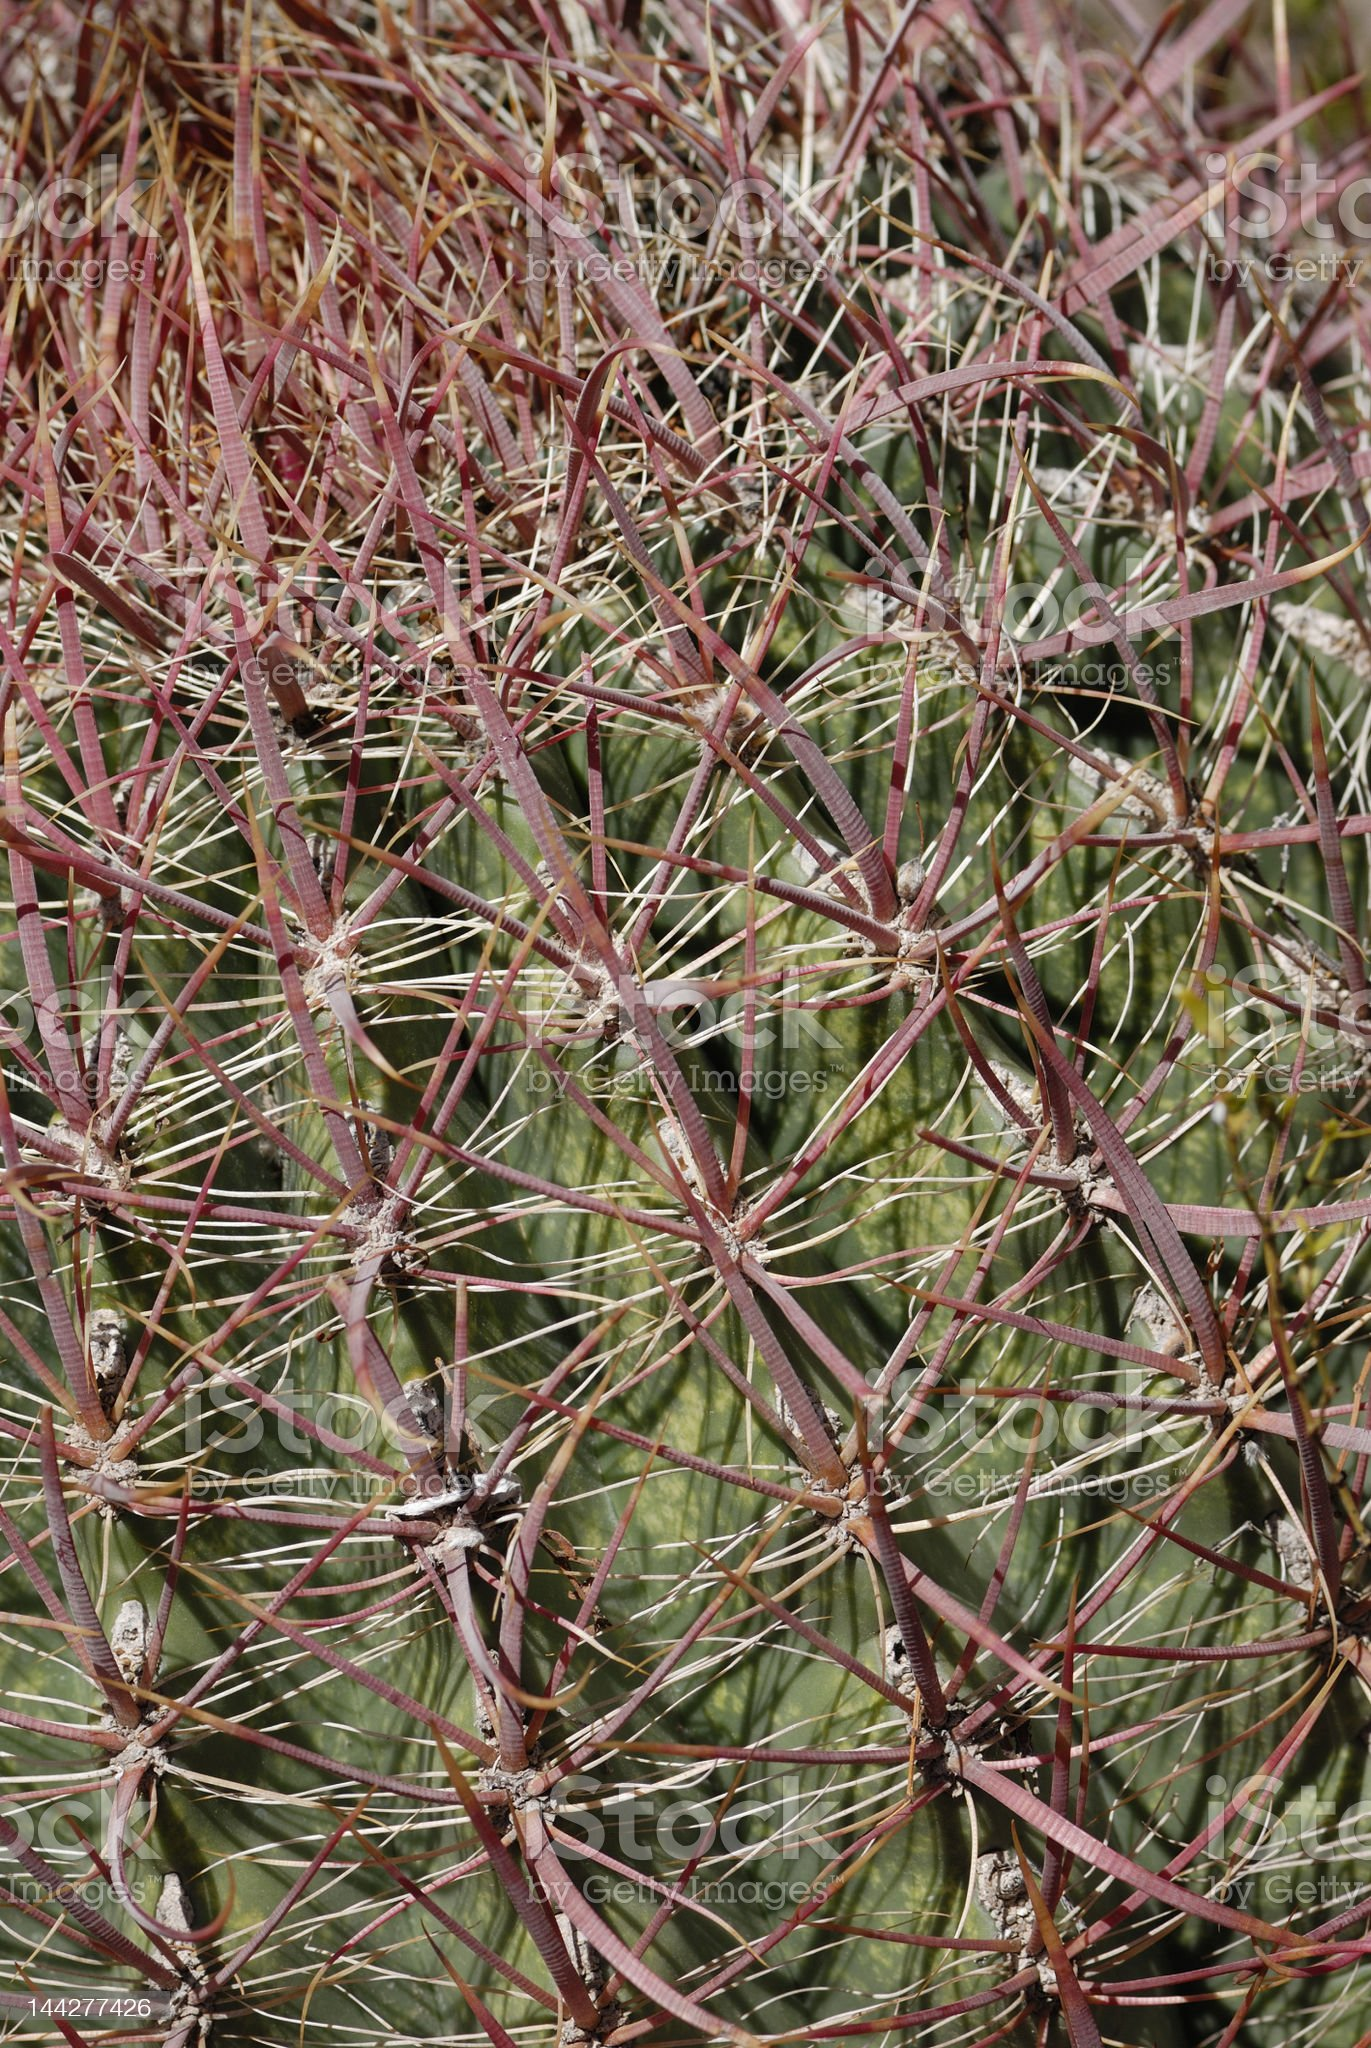 barrel cactus 1 royalty-free stock photo